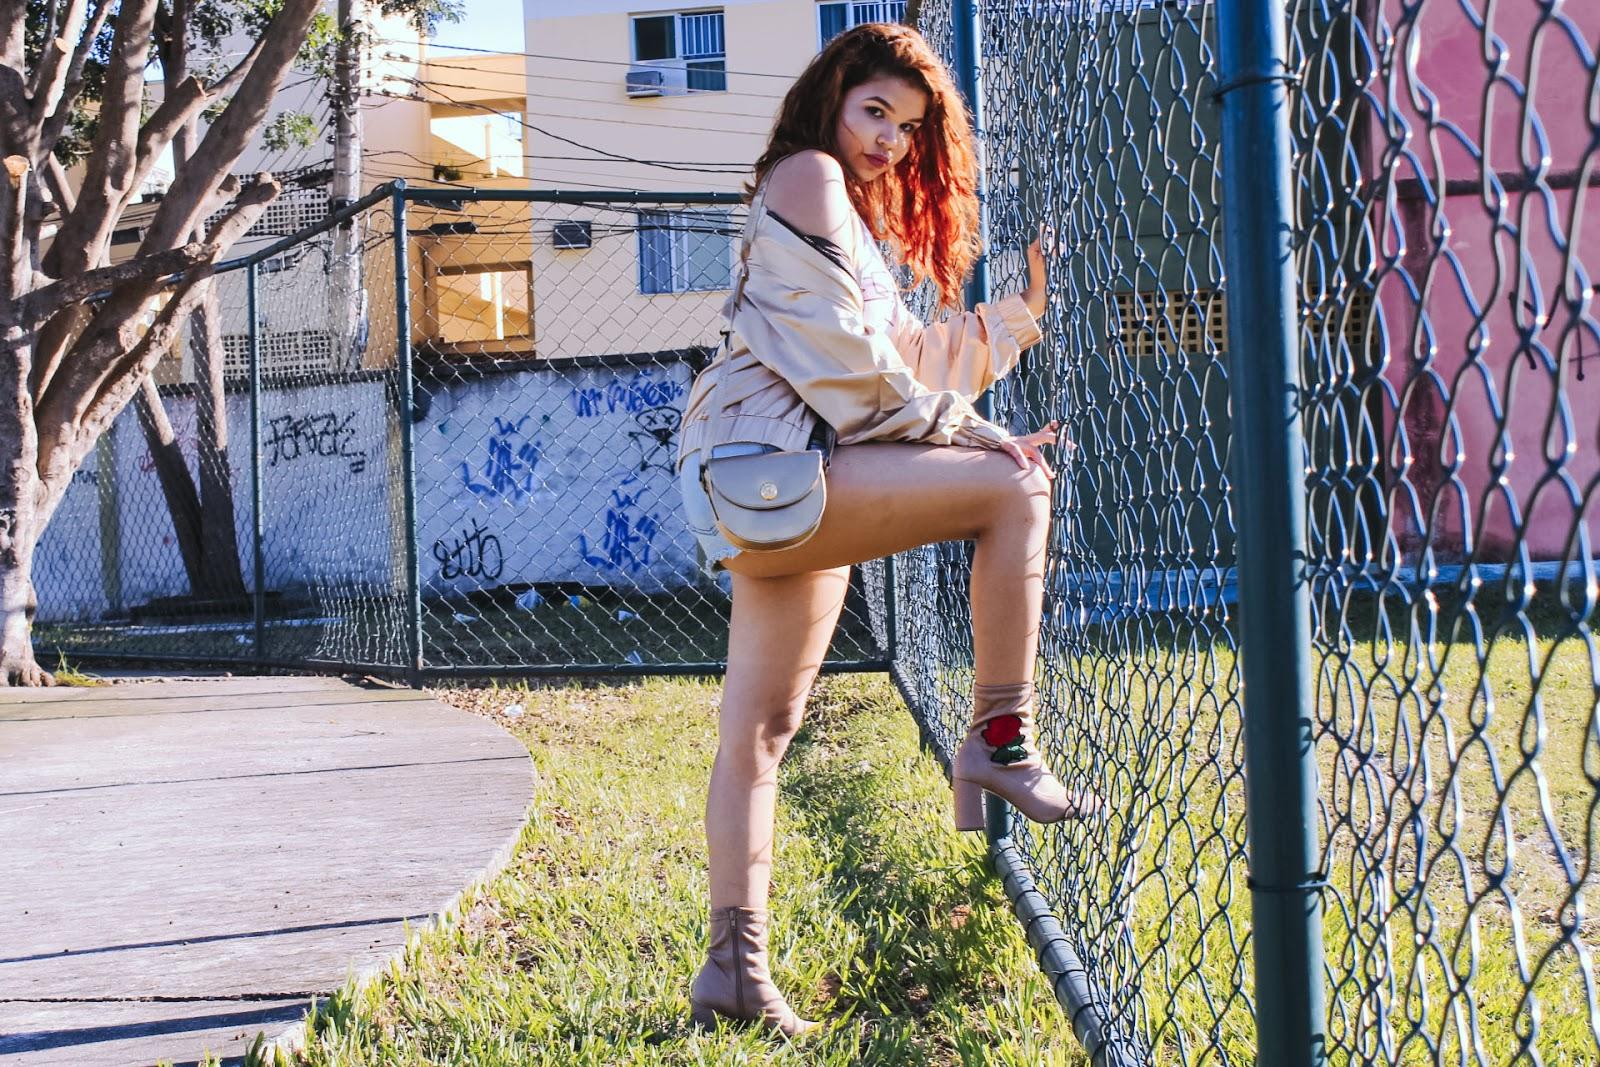 look street style, look urbano, bomber jacket, look bomber dourada, look bota bordada com flor, look girl power, look shorts com bota, look bomber com shorts, look neutro